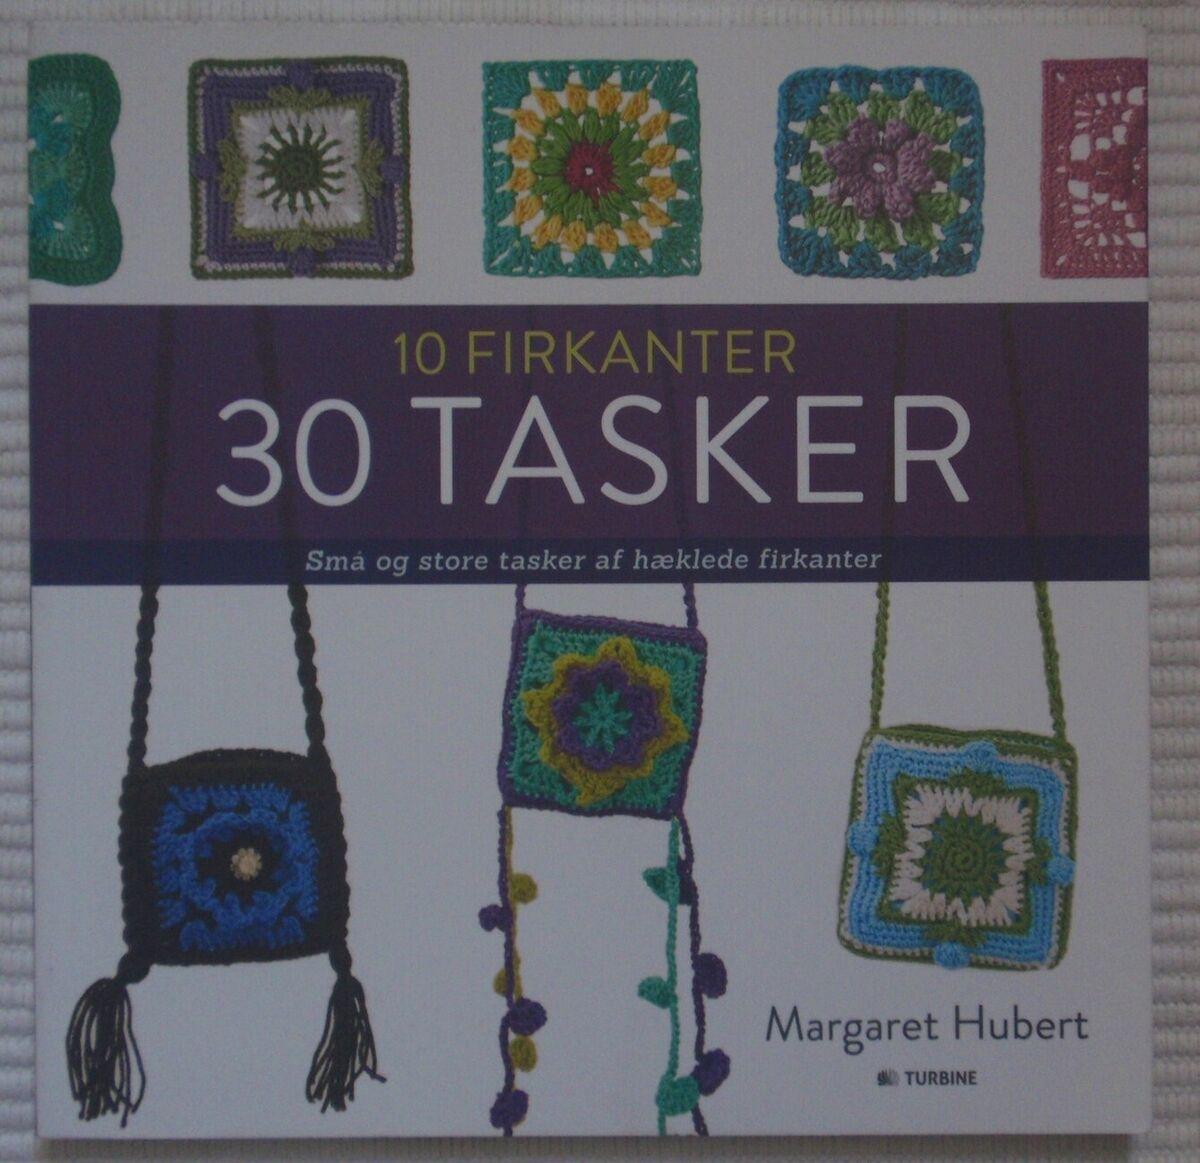 10 Firkanter 30 Tasker, Hubert Mararet, emne: håndarbejde